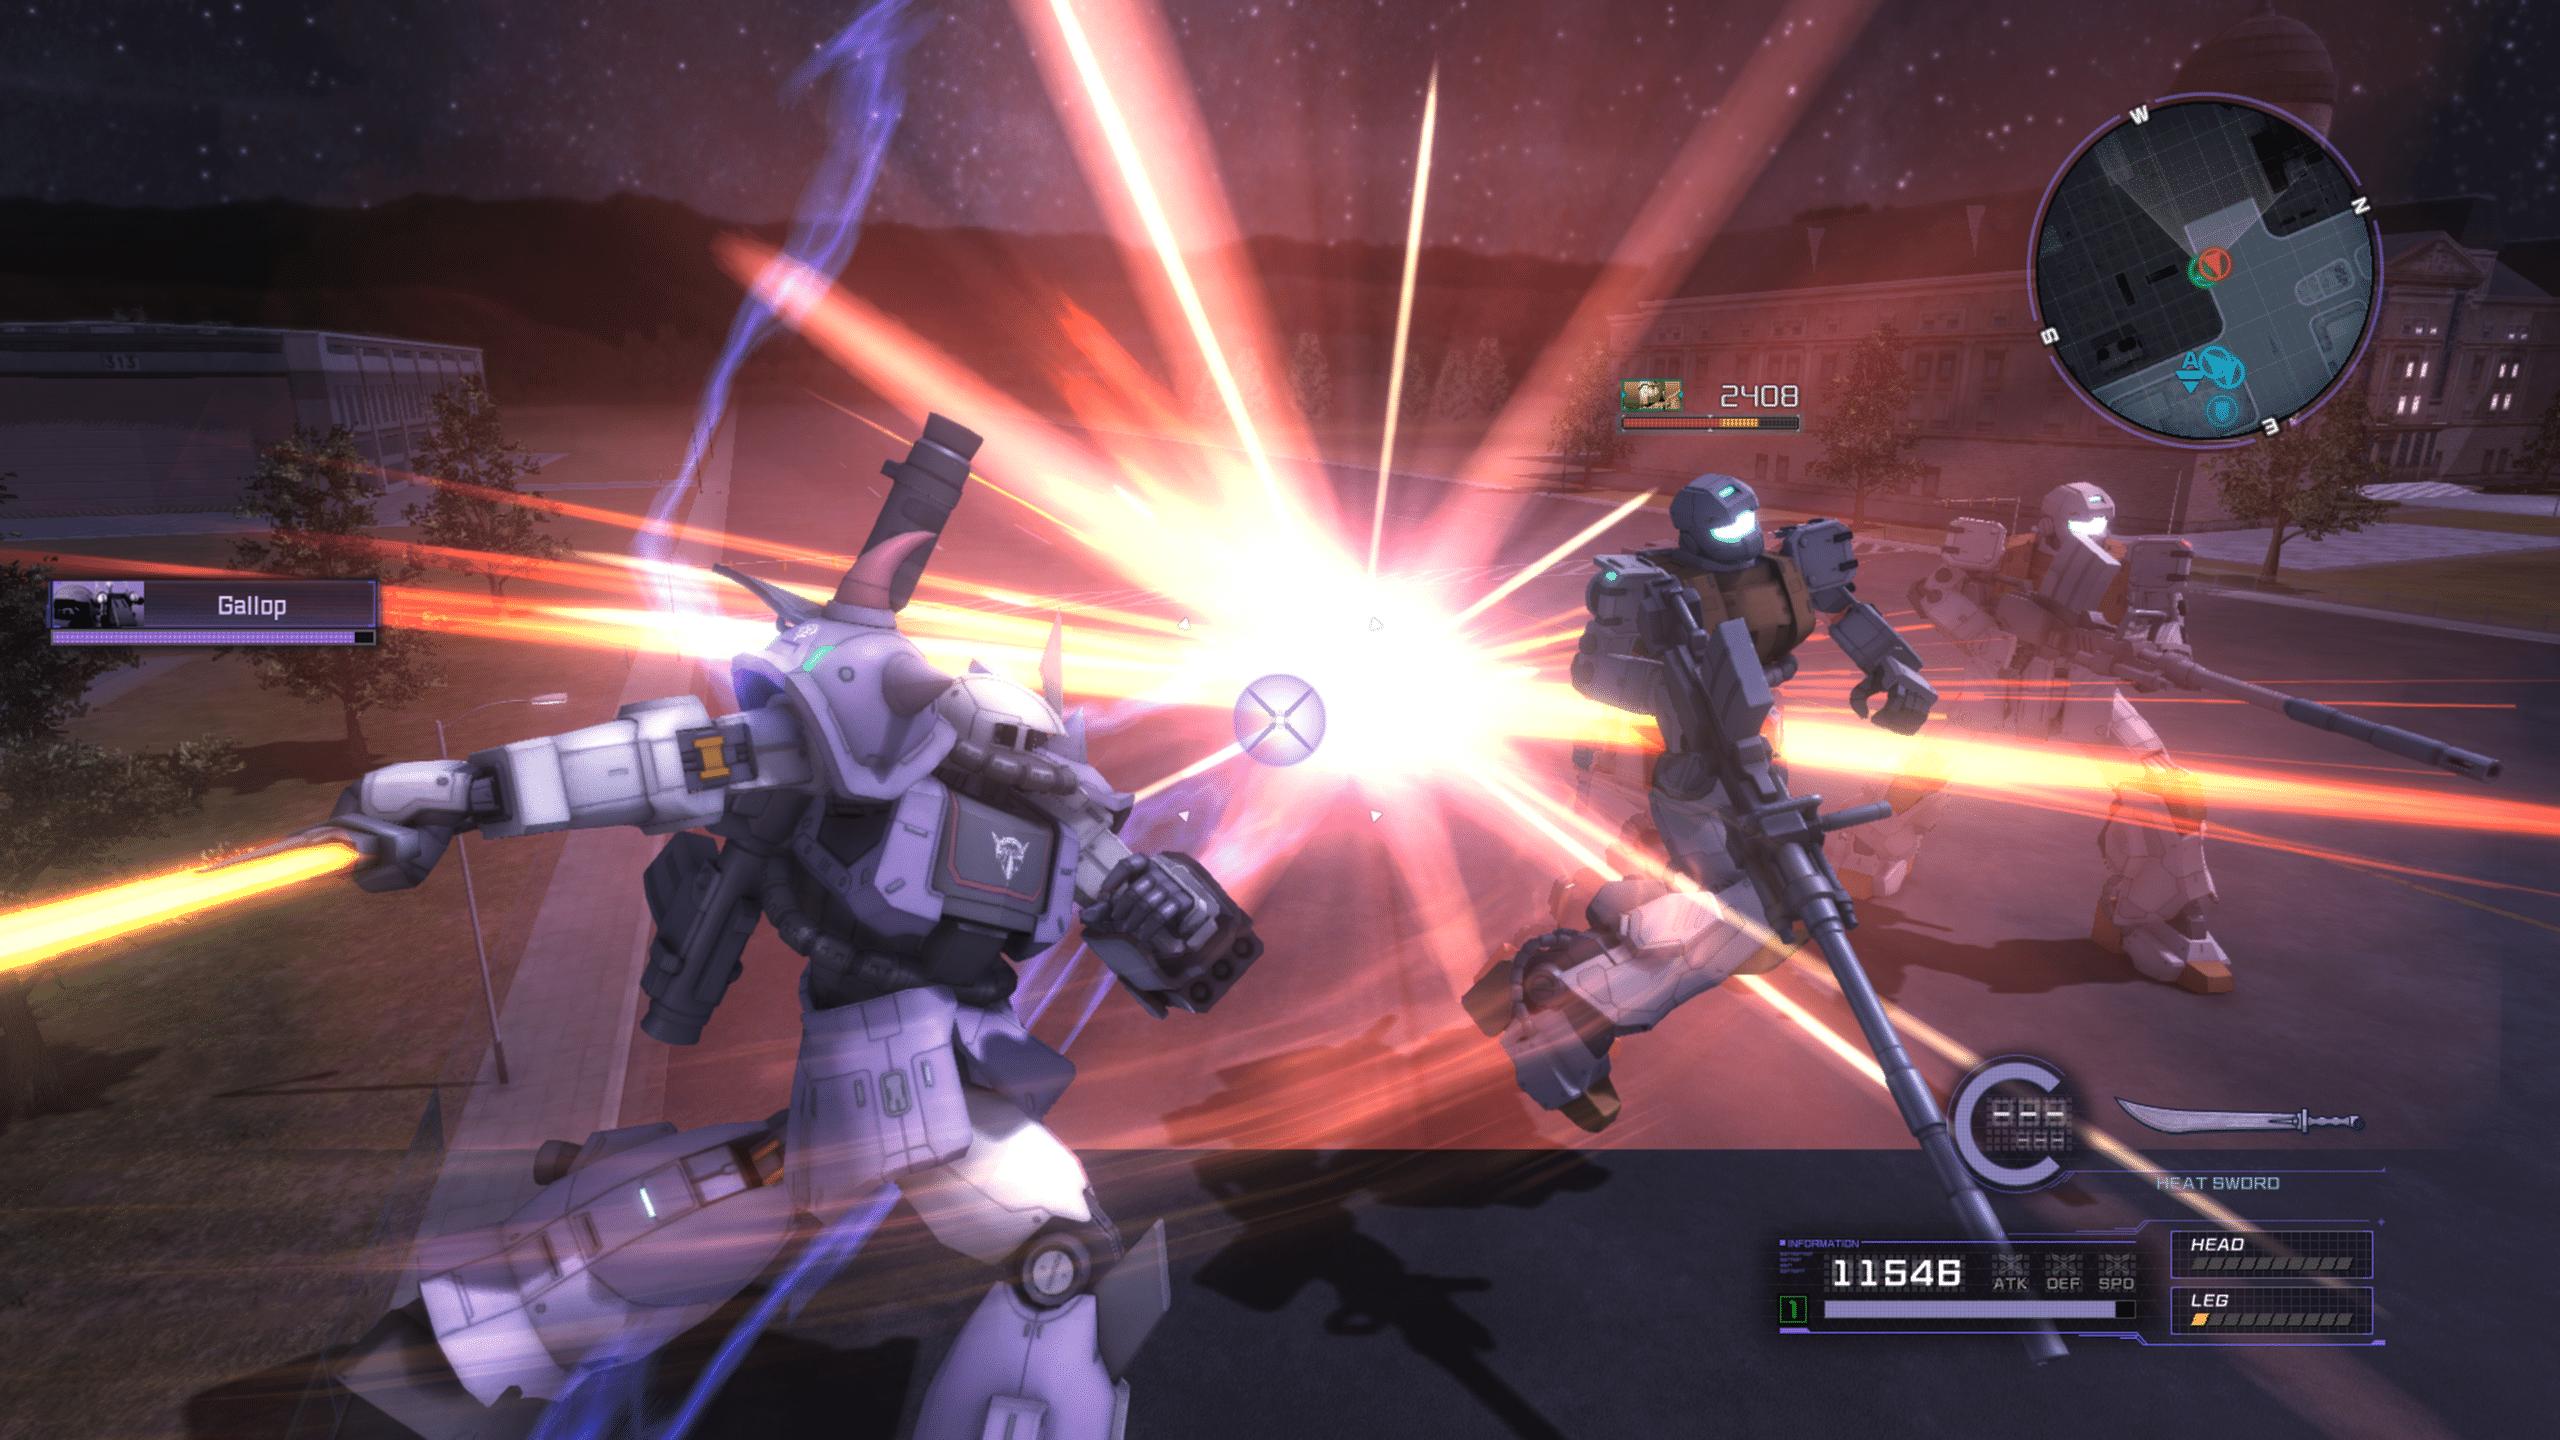 Sta per arrivare Mobile Suit Gundam Battle Operation Code Fairy per PlayStation 4 e 5 thumbnail